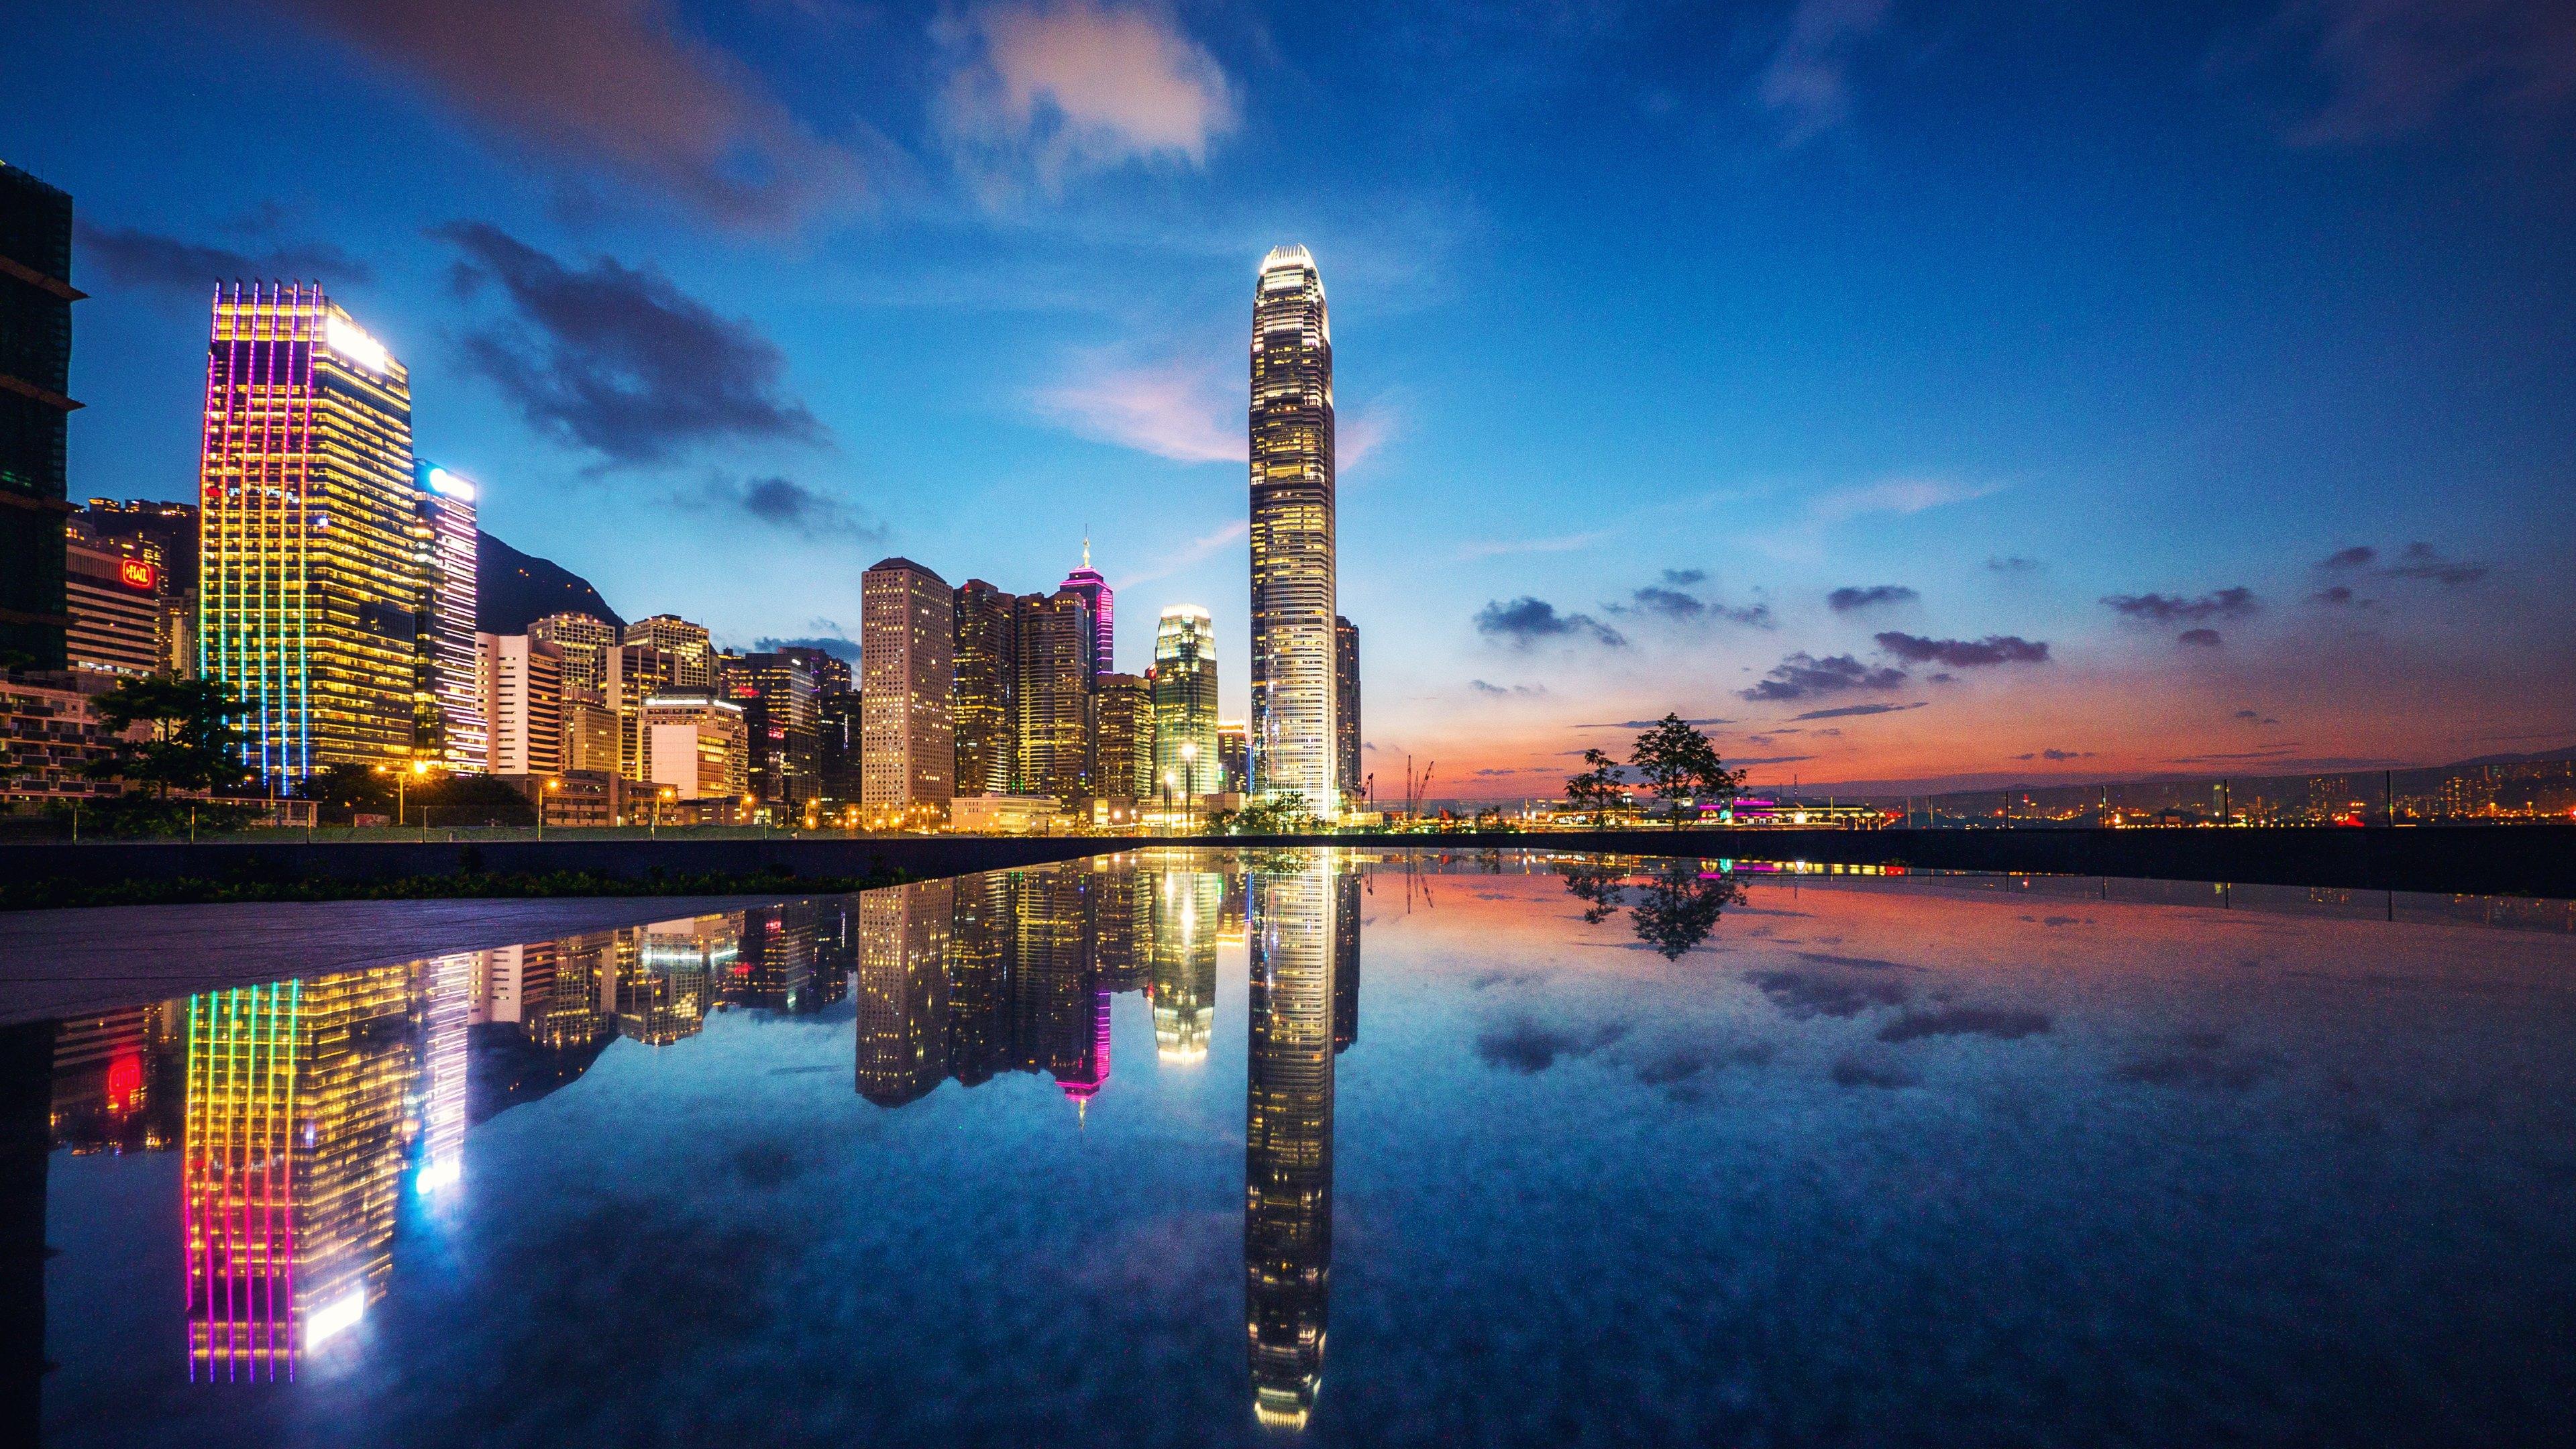 Hong Kong 4k Ultra Hd Wallpaper Background Image 3840x2160 Id